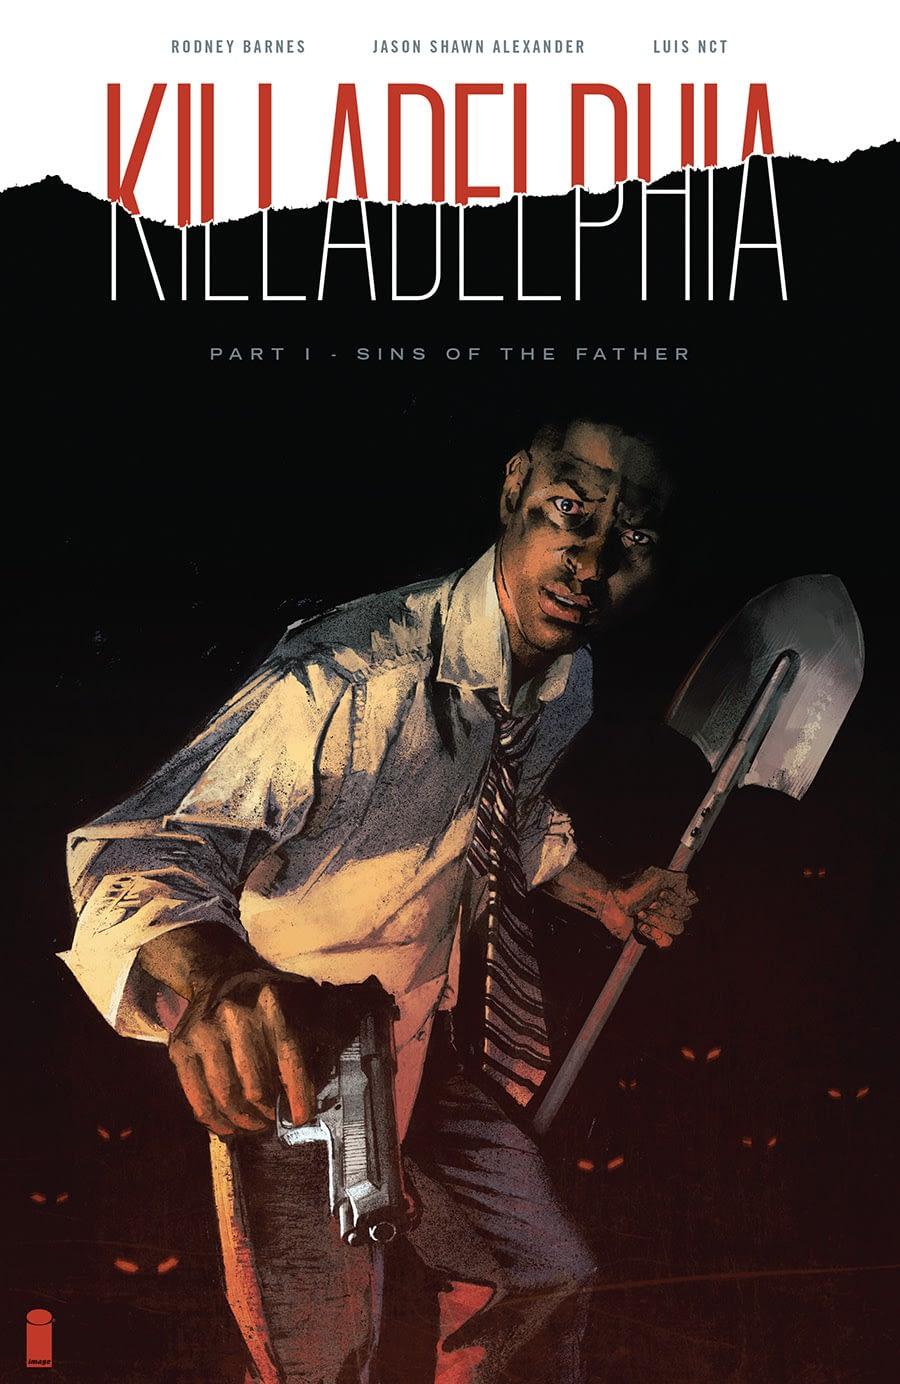 Chris Rock Calls Jason Shawn Alexander's Killadelphia